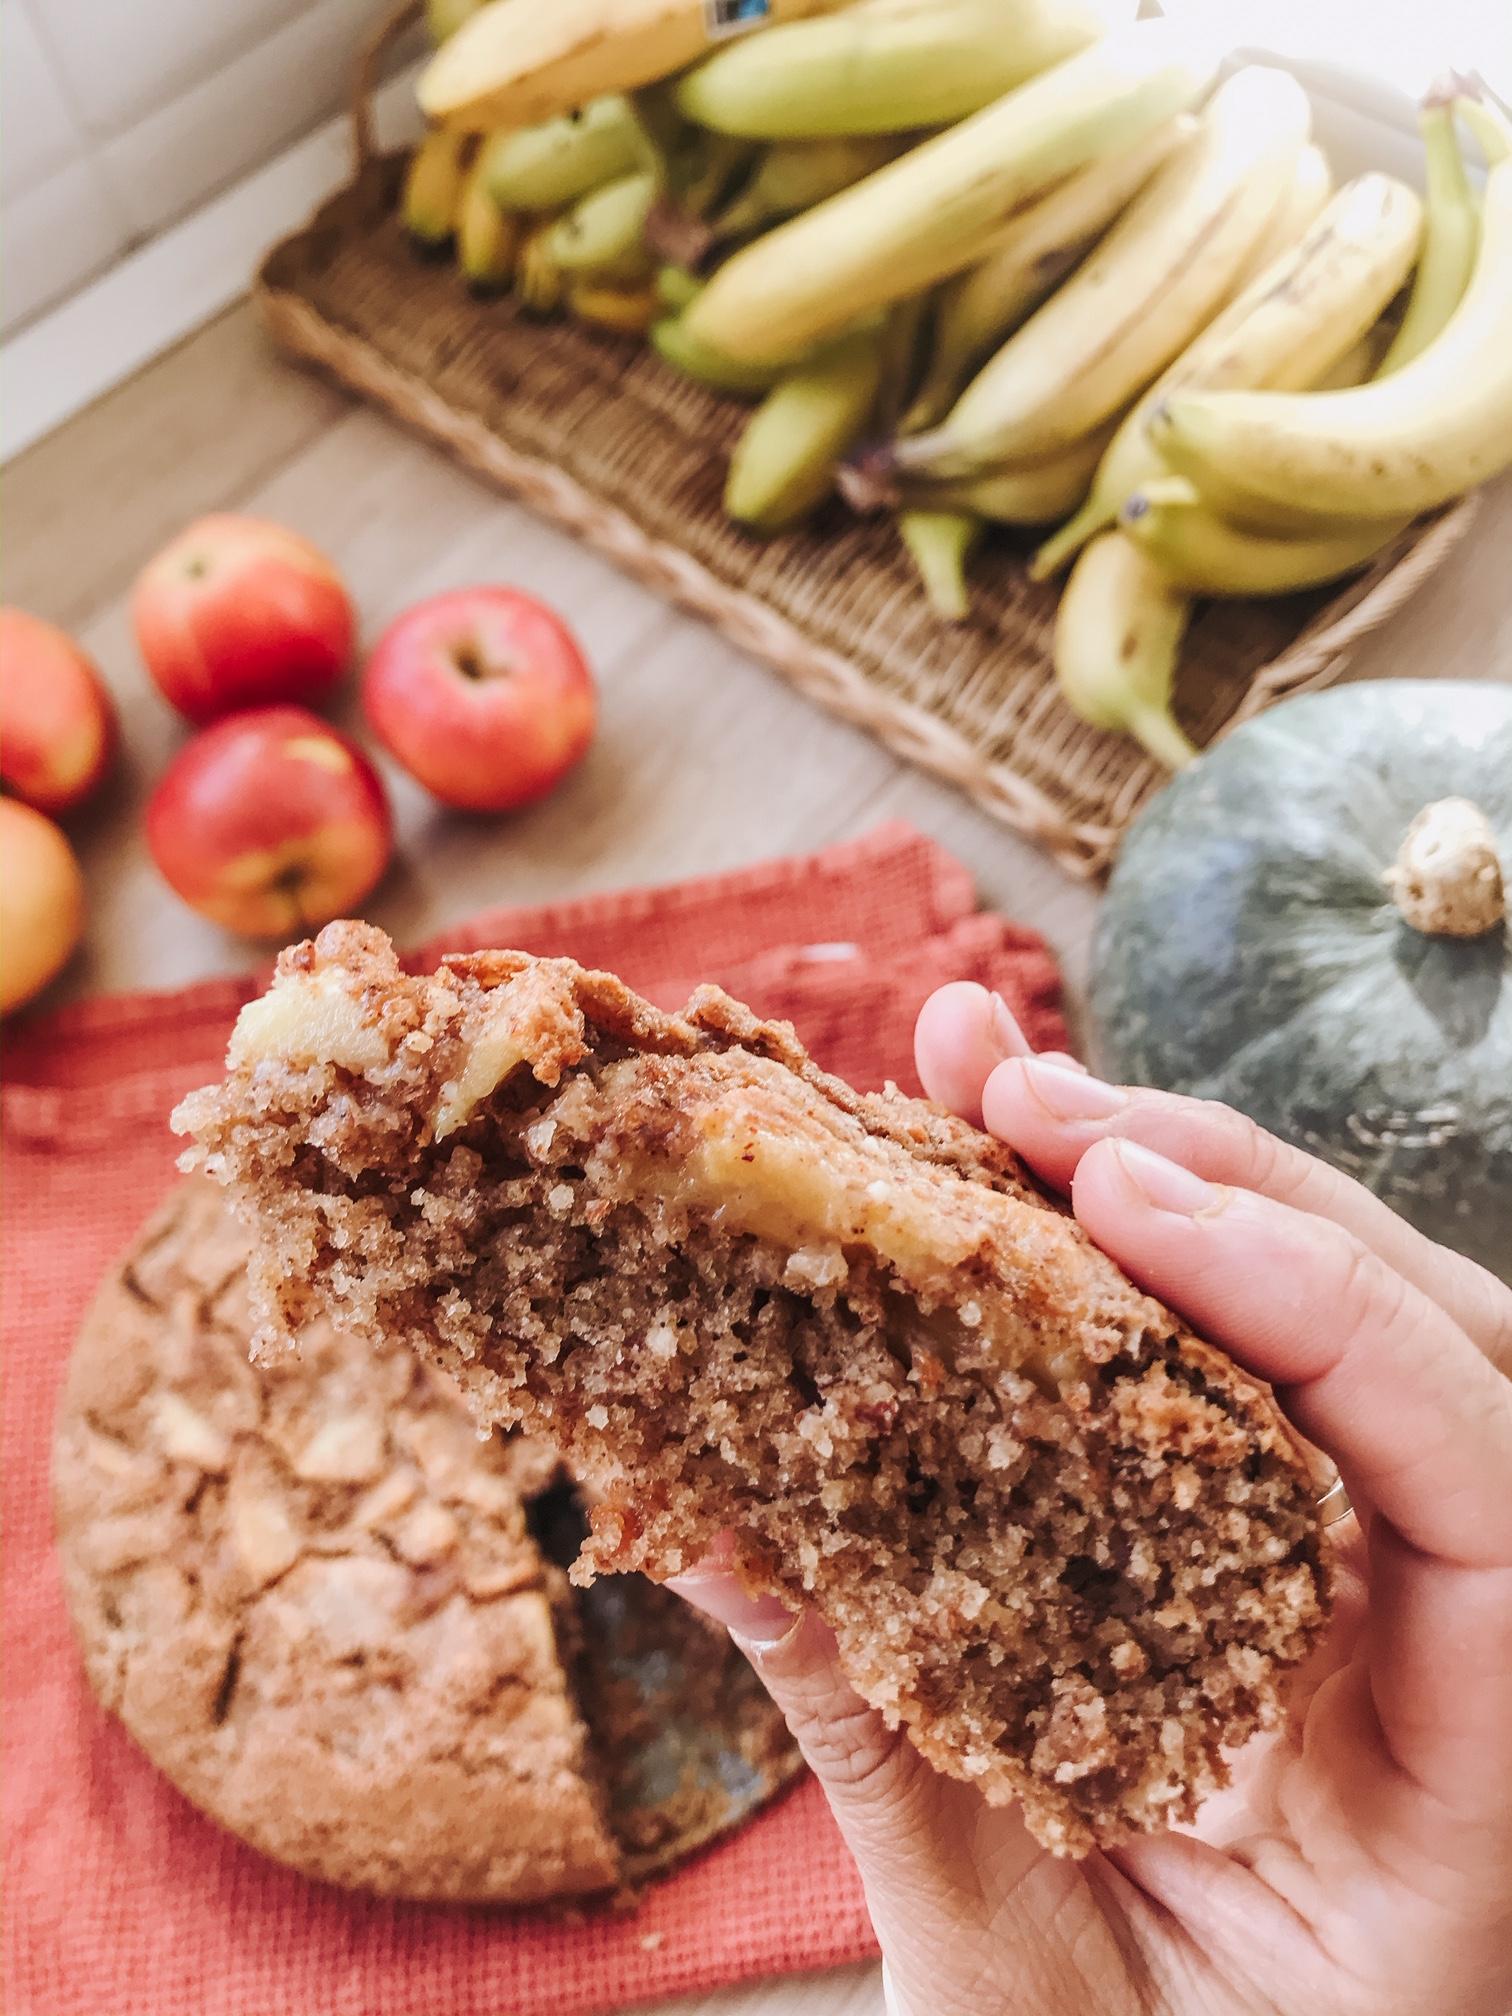 torta di mele, mele, torta, vegan, ricetta, blog, mama rainbow, famiglia, bambini, sano, cibo vero, integrale, salute, ricetta vegana